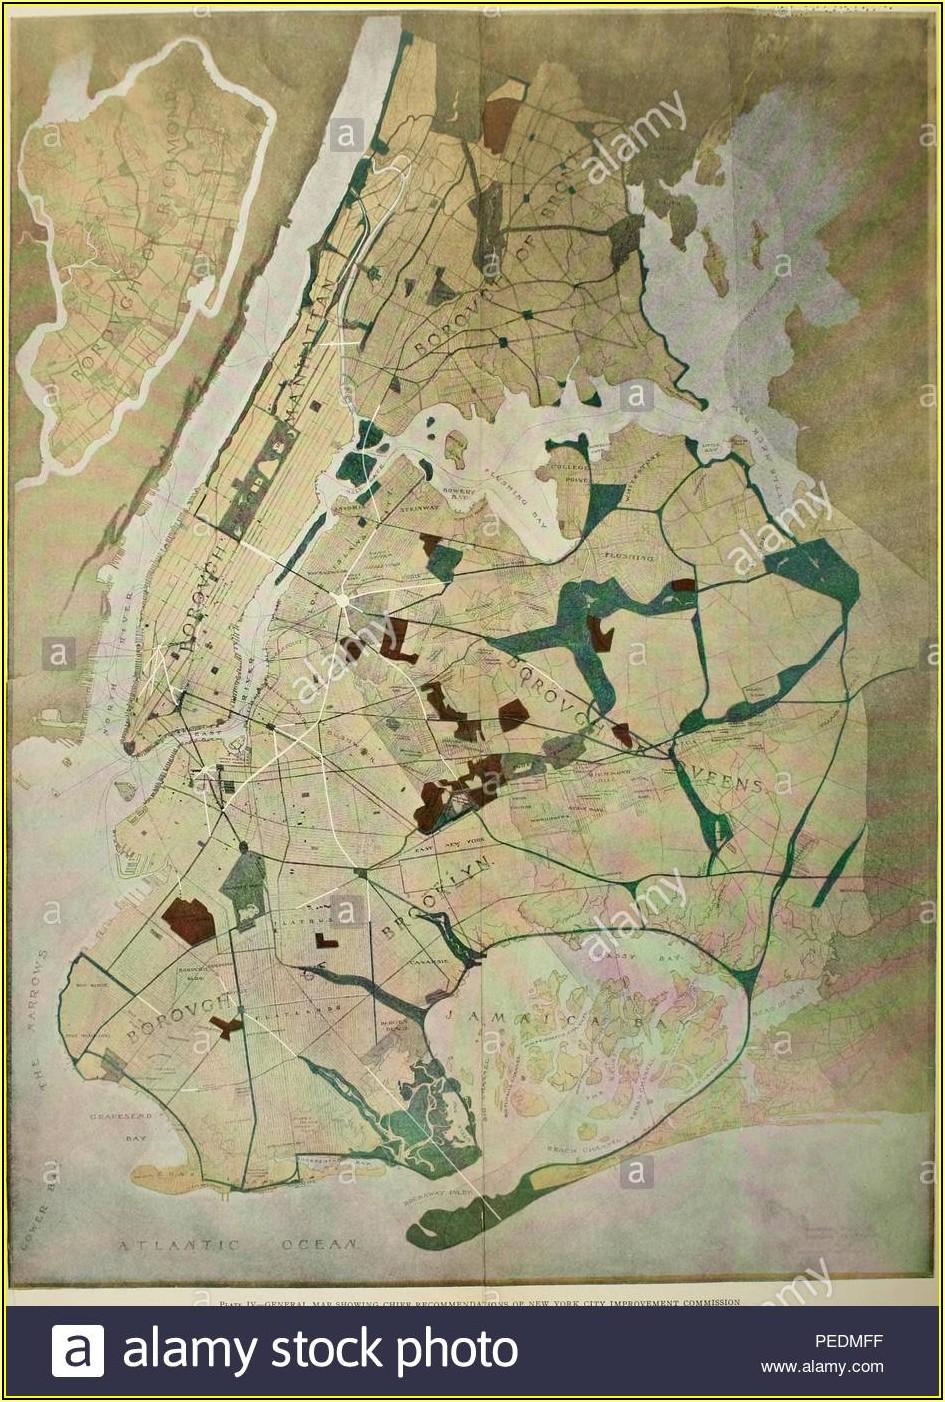 Map Of New York City Boroughs And Neighborhoods